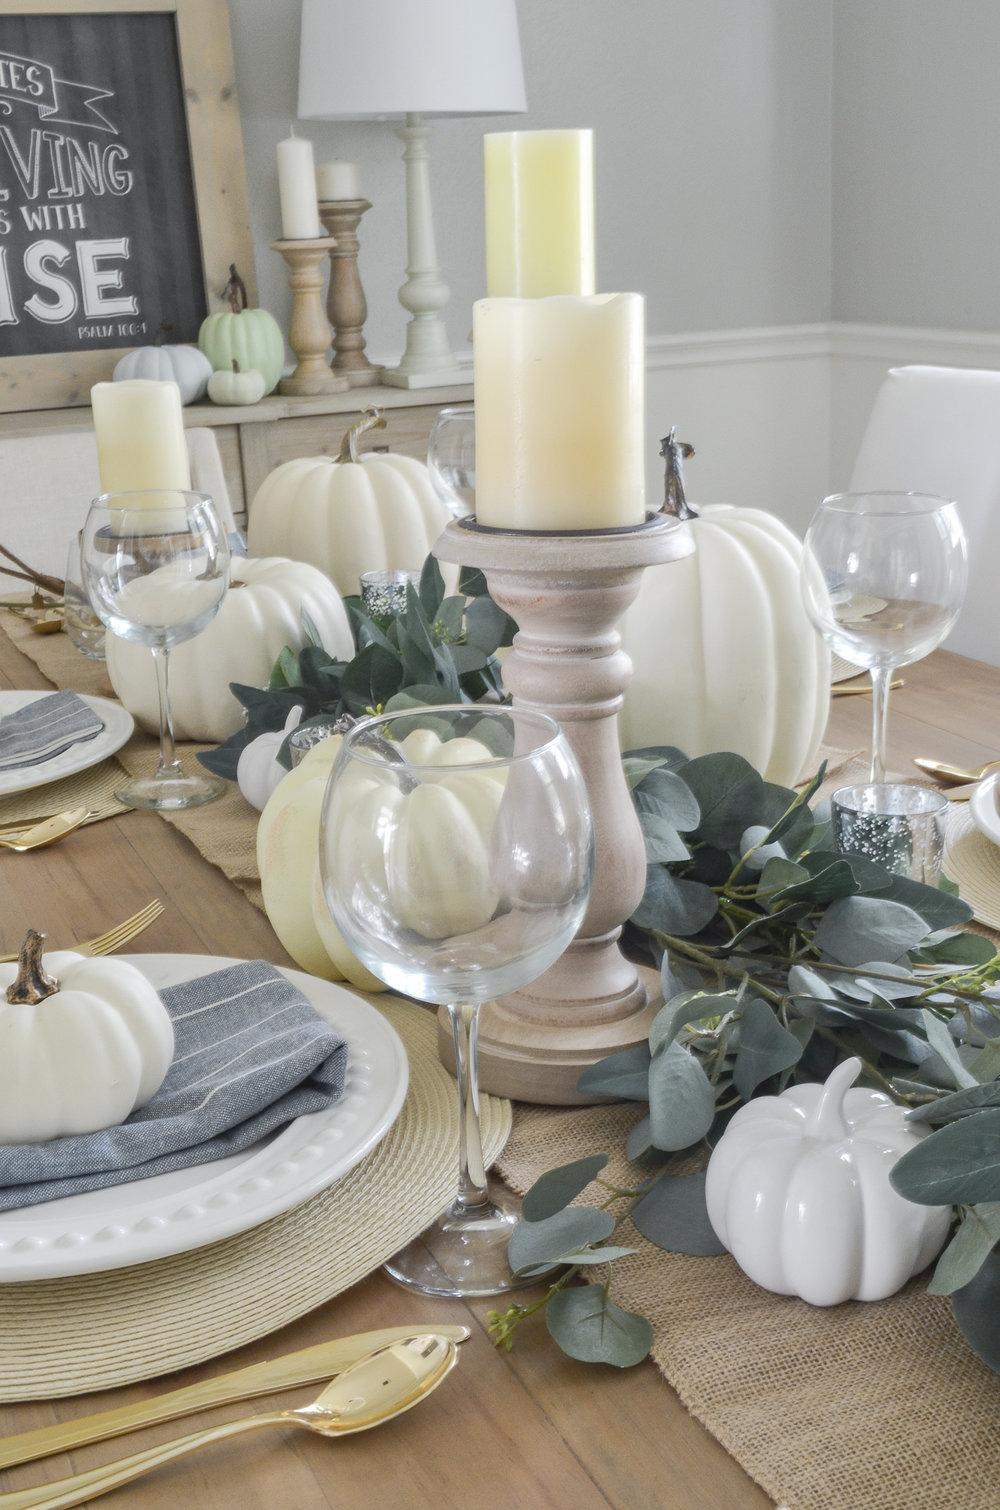 A Simple Fall Farmhouse Tablescape that uses neutral pumpkins, burlap, eucalyptus, and candles.